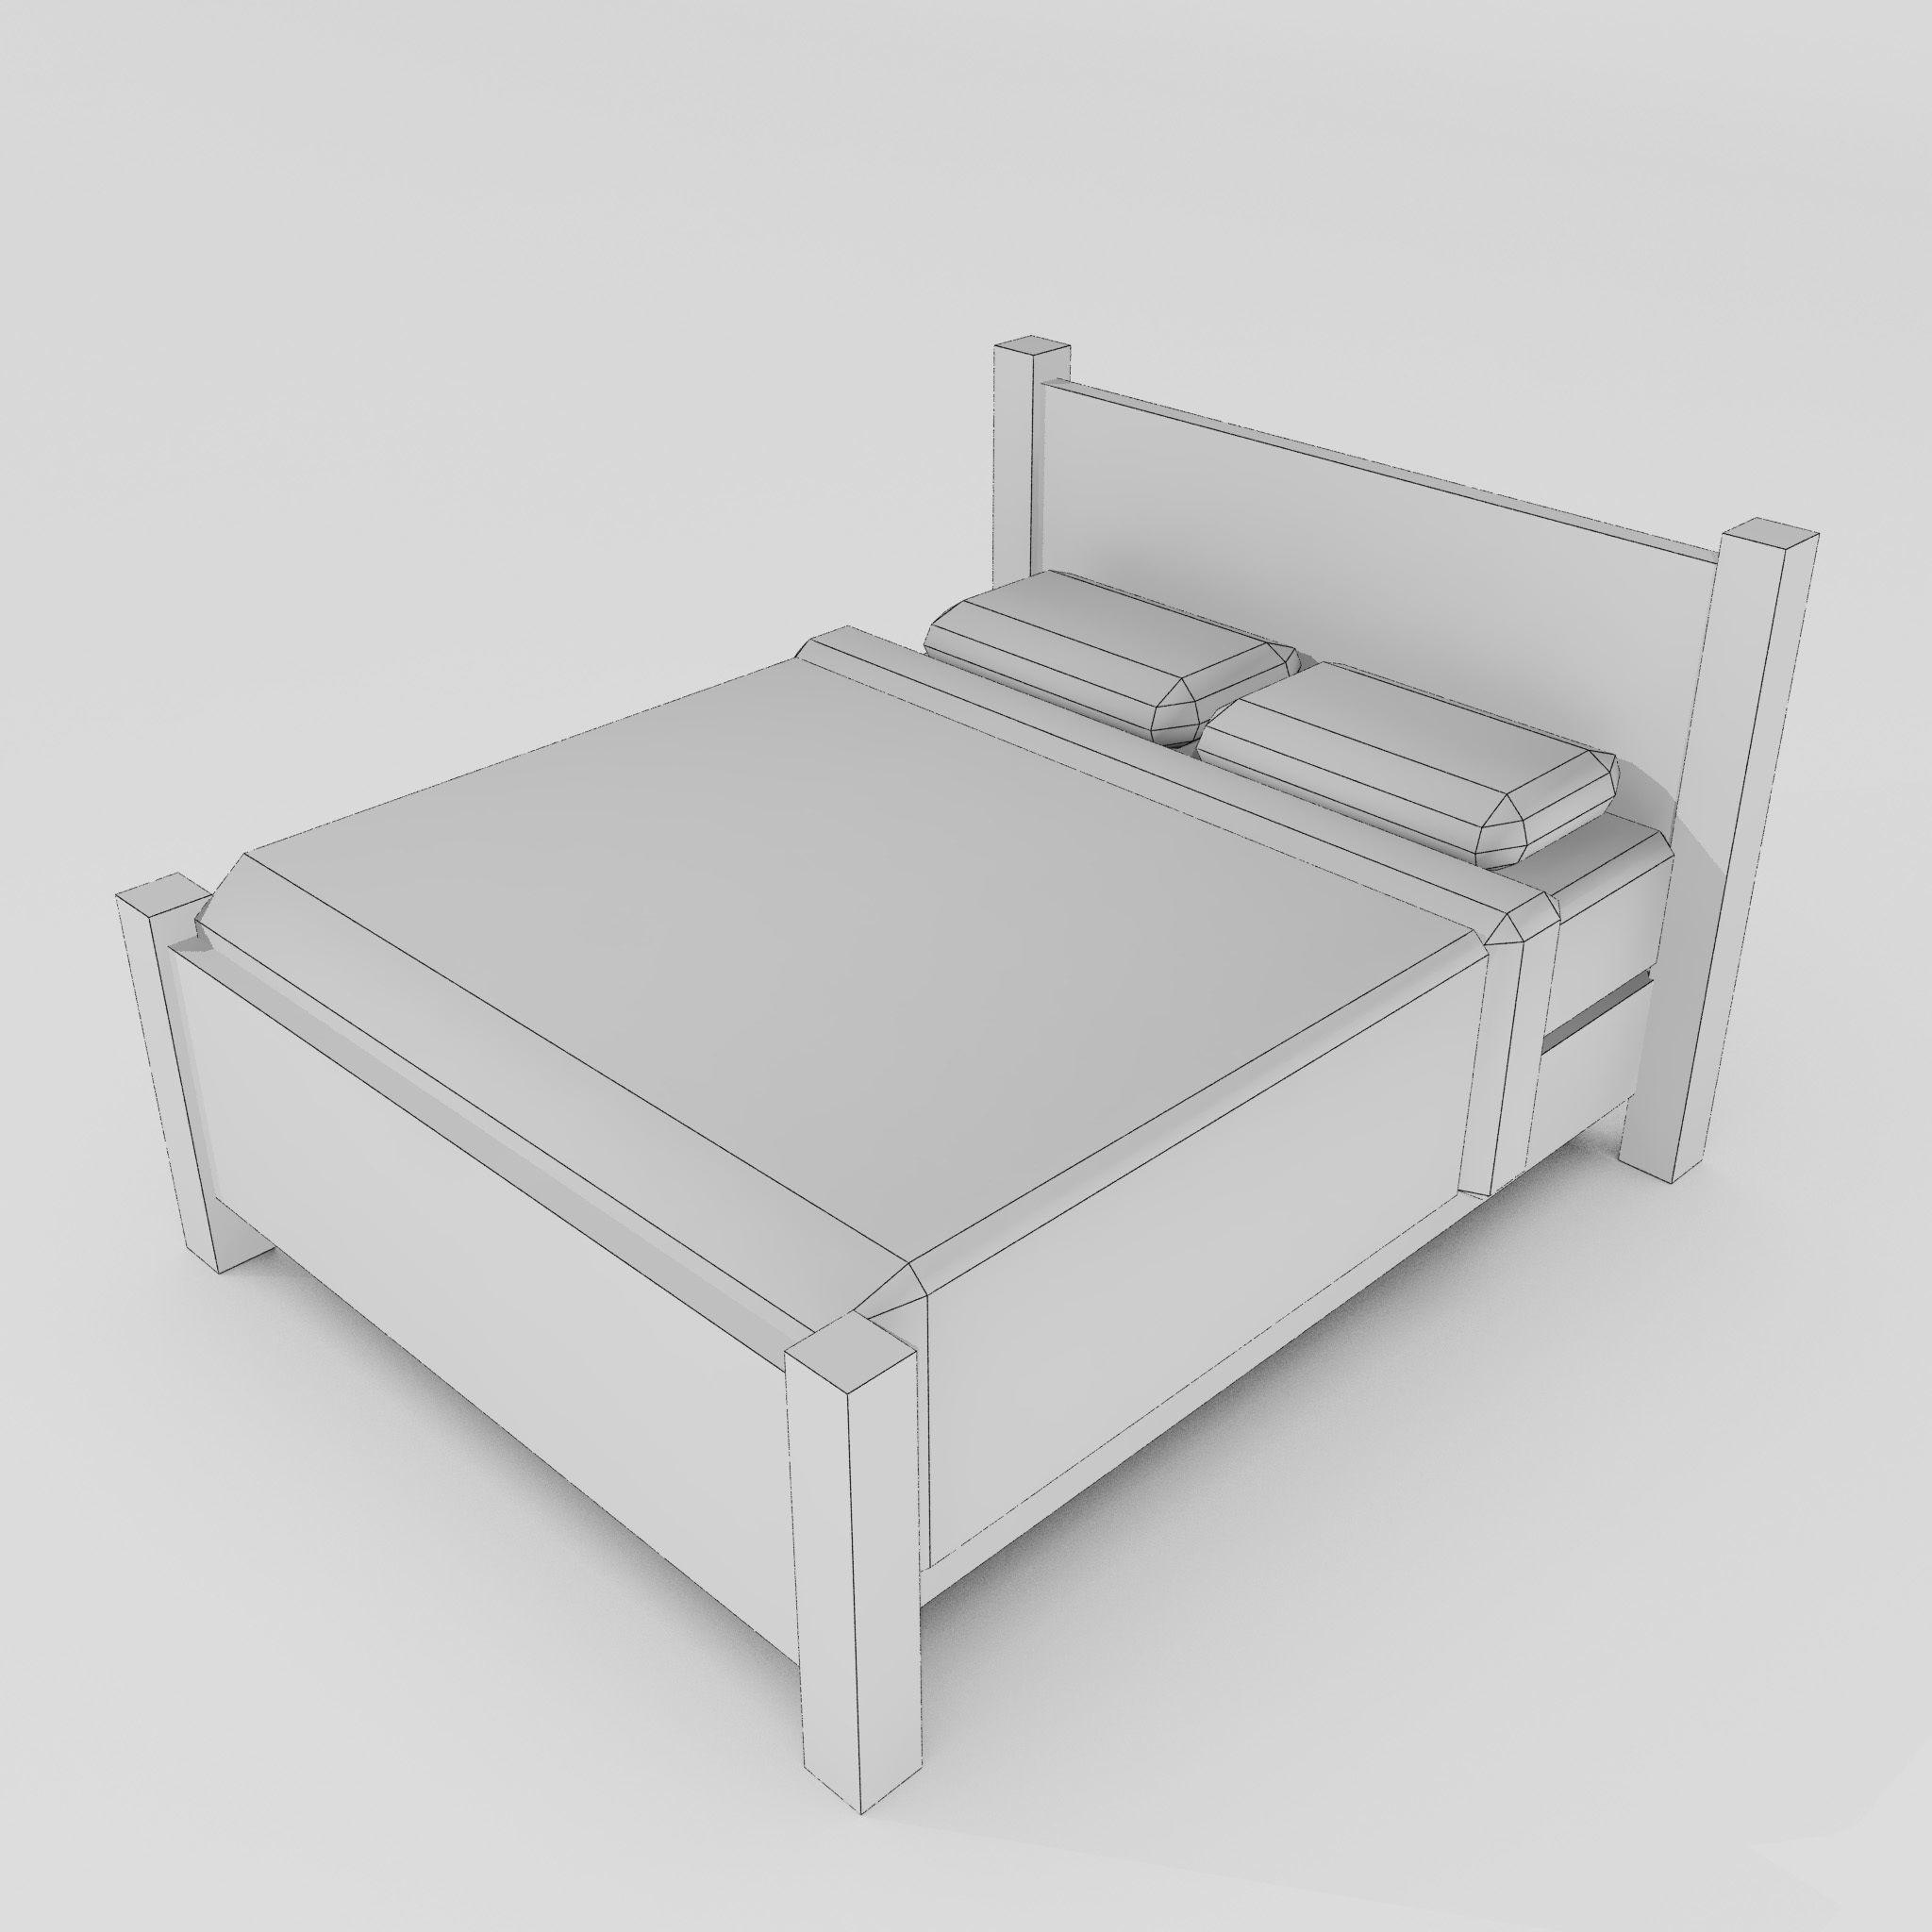 ... Double Bed 3d Model Max Obj 3ds Fbx Mtl Unitypackage 5 ...